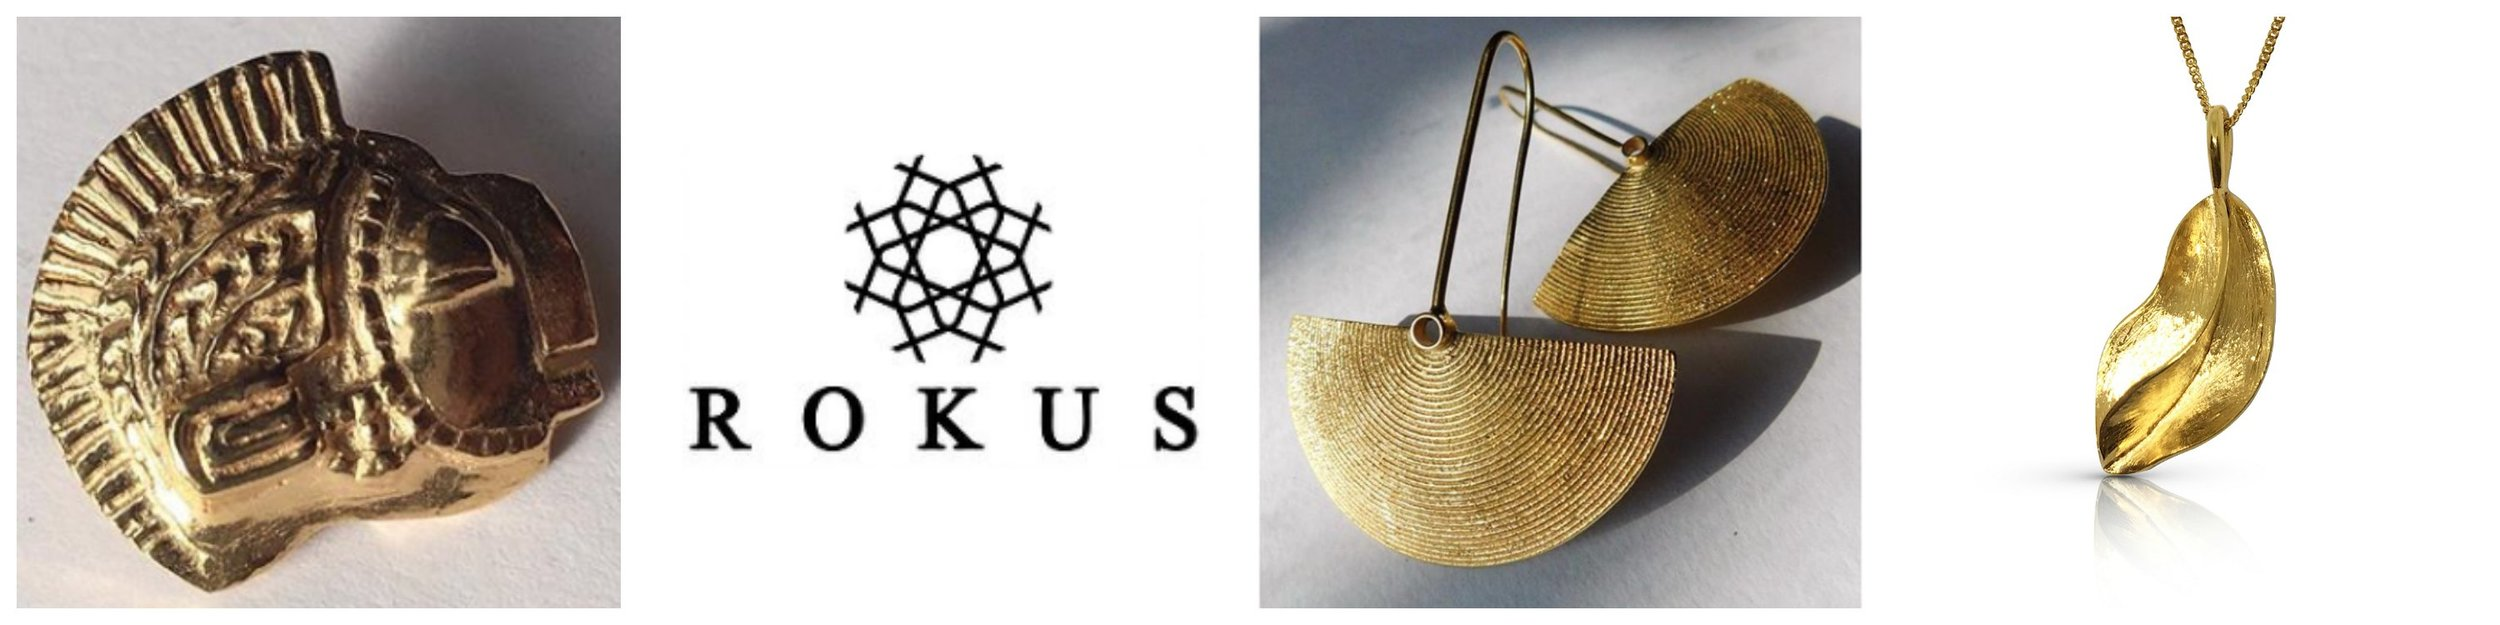 ROKUS-Collage4.jpg